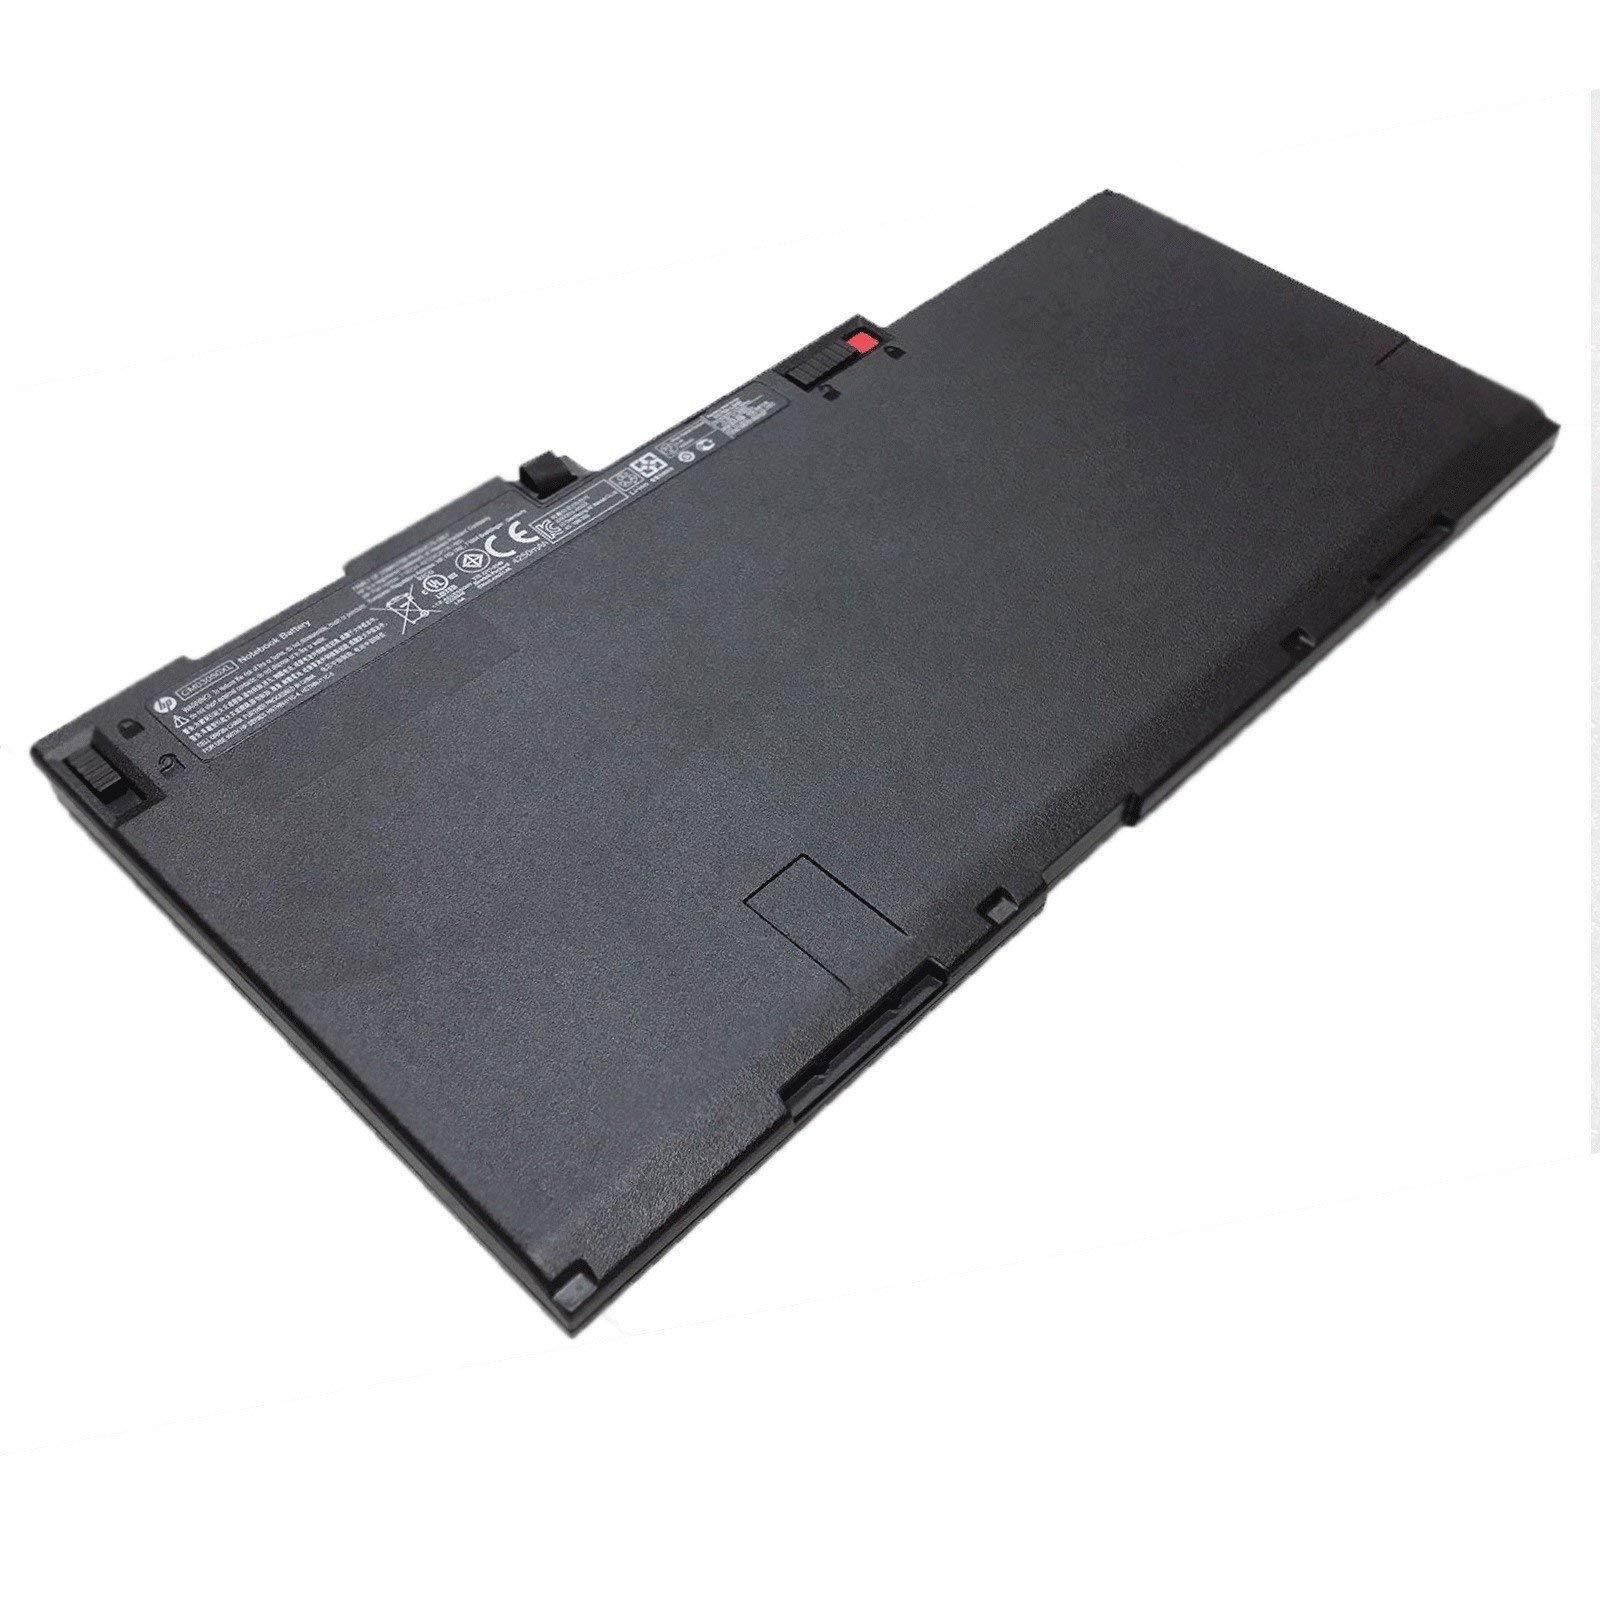 New Genuine HP EliteBook 840 850 855 740 750 G1 G2 ZBook 14 11.1V 24Wh Battery 717375-001